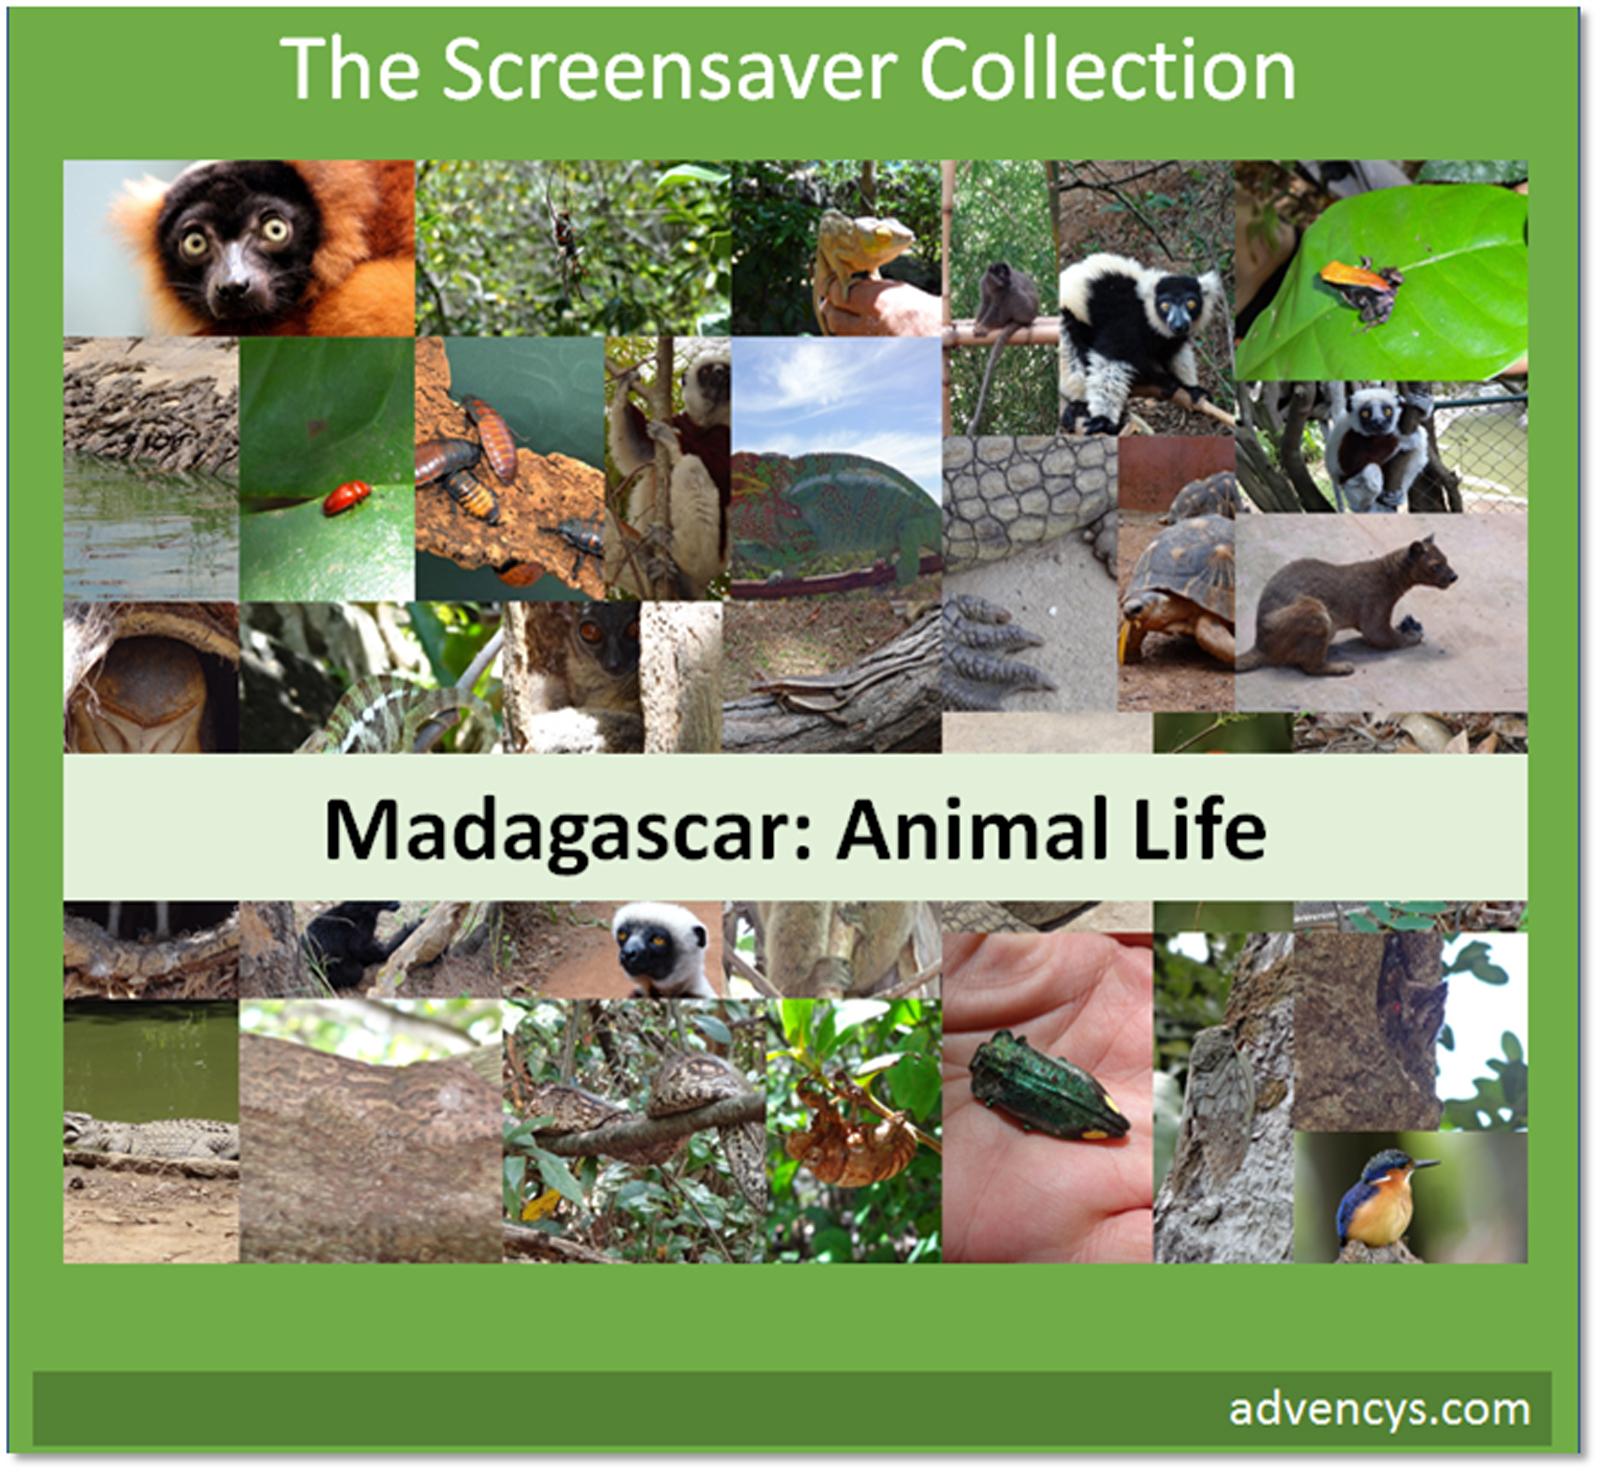 madagascar-animal-life-screensaver-download